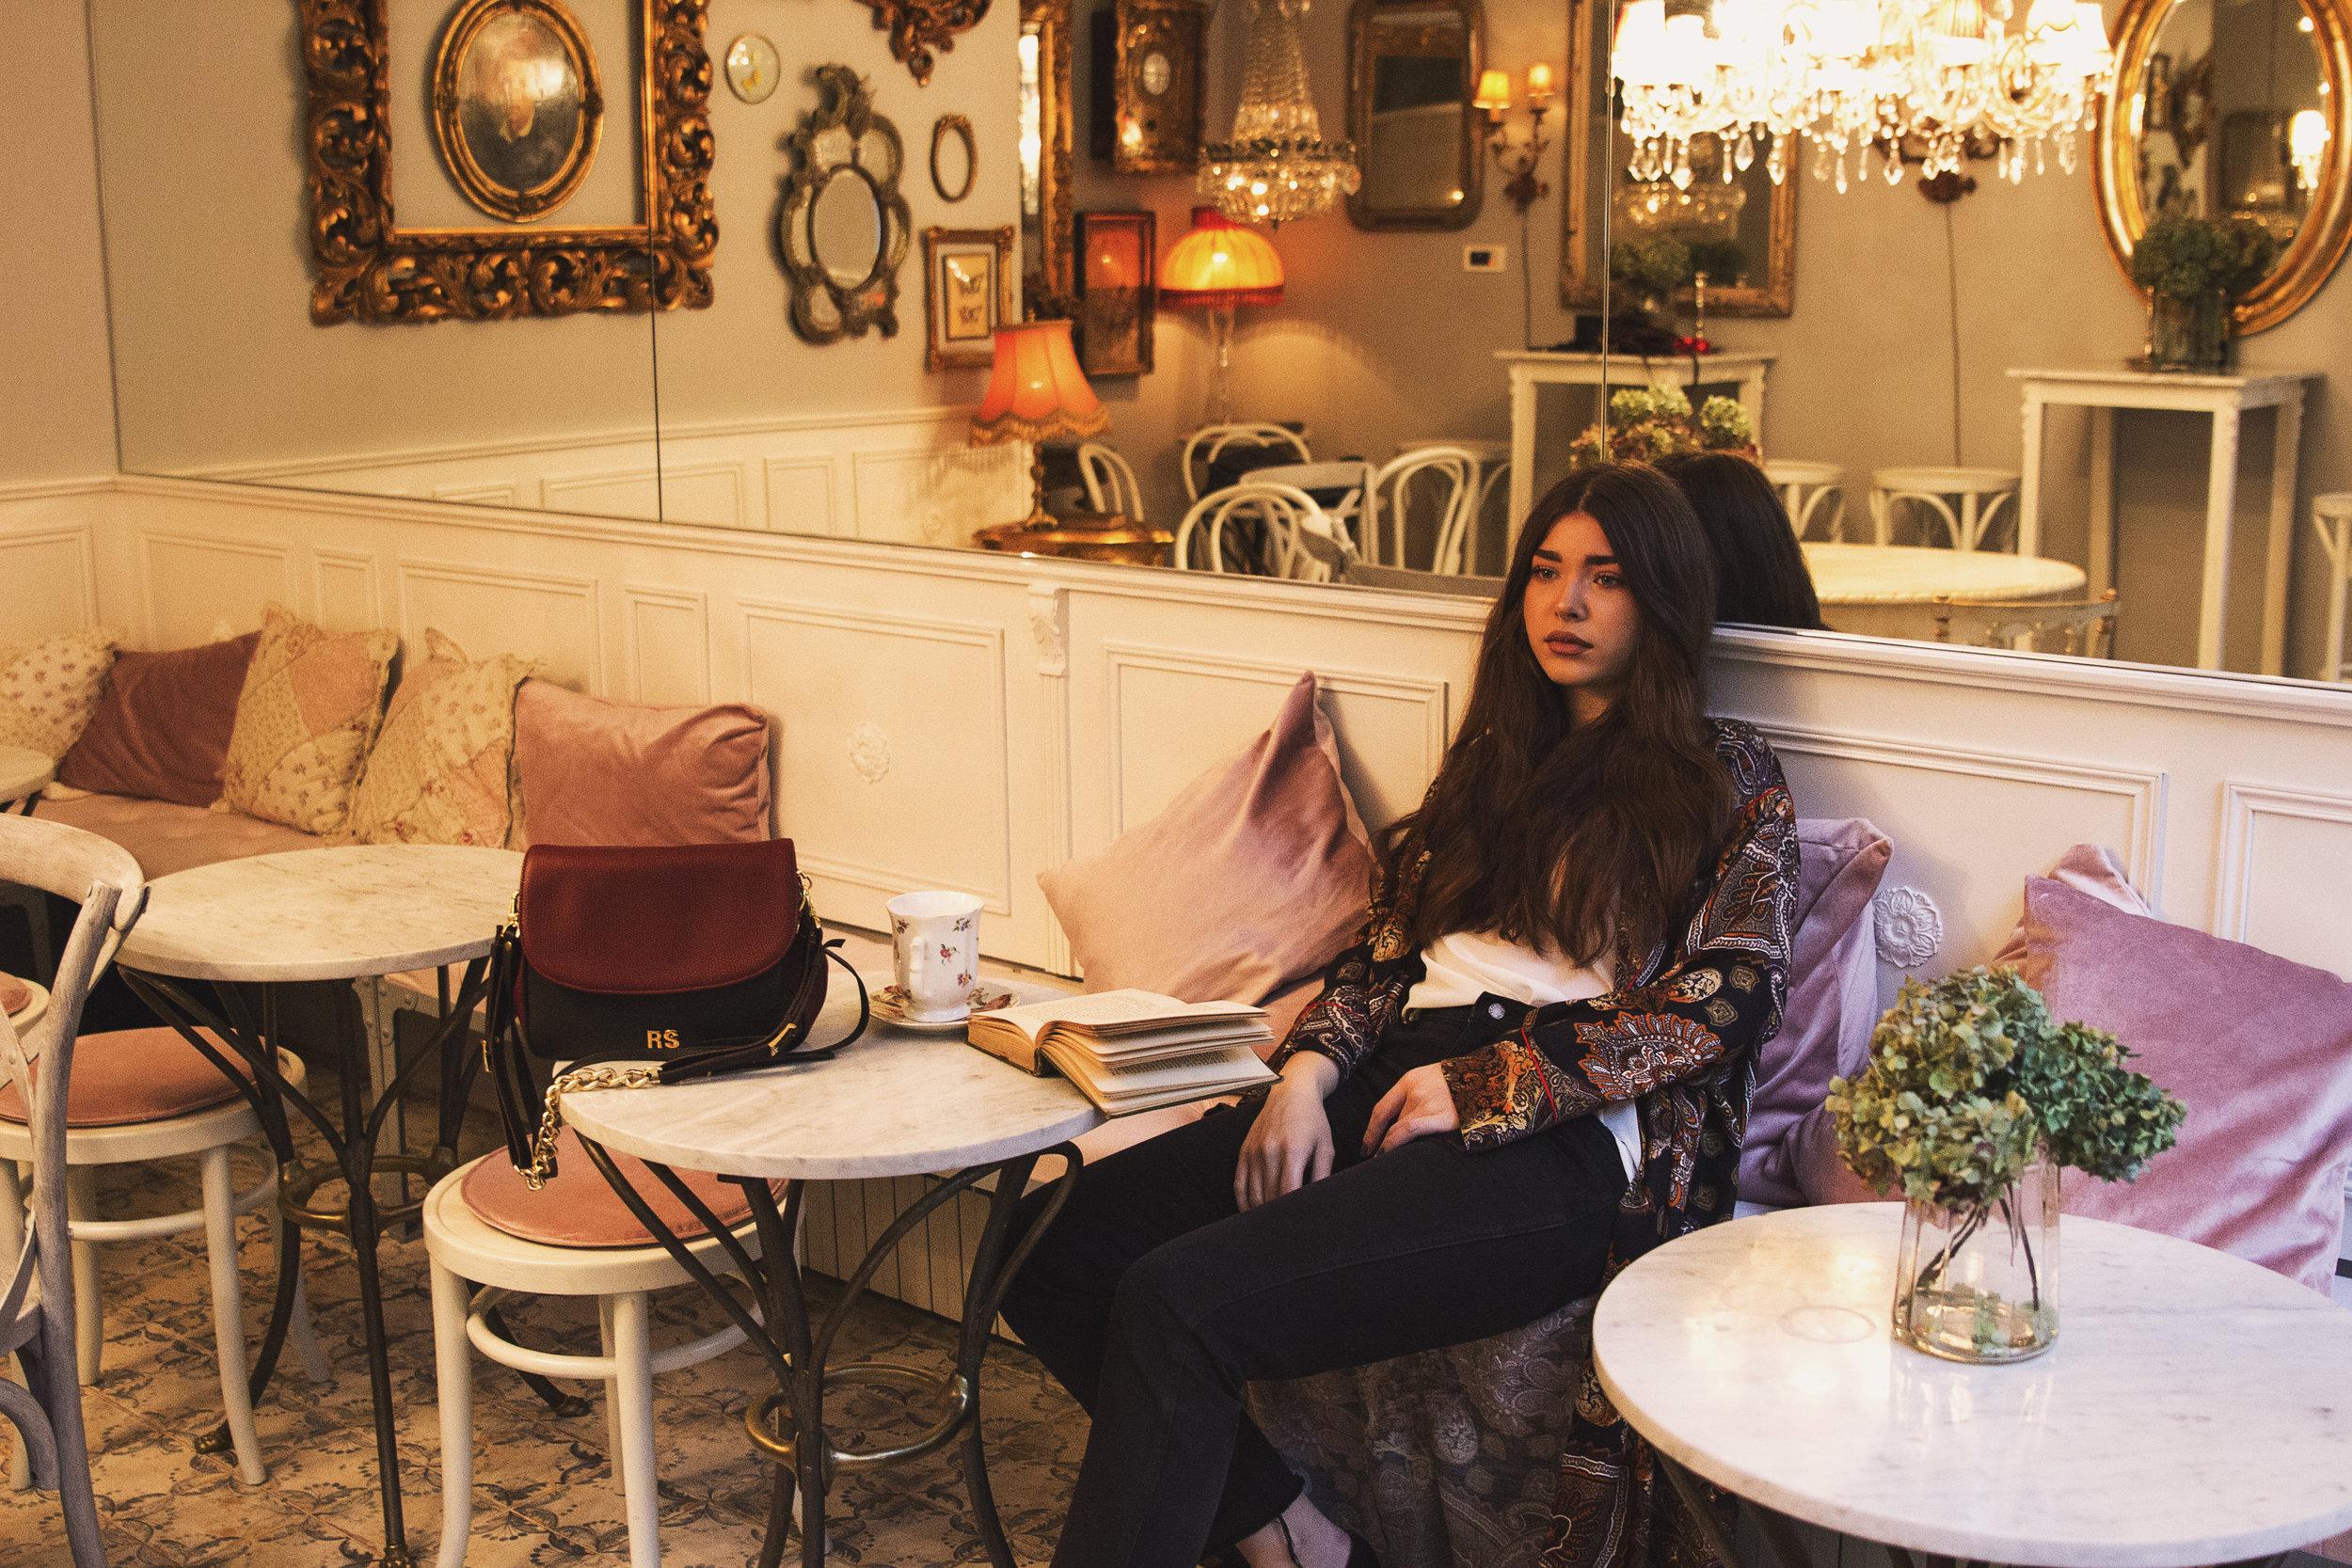 fashion-editorial-robert-sever-caffe-bar-finjak-expensive-reality-fashion-photography (2).jpg